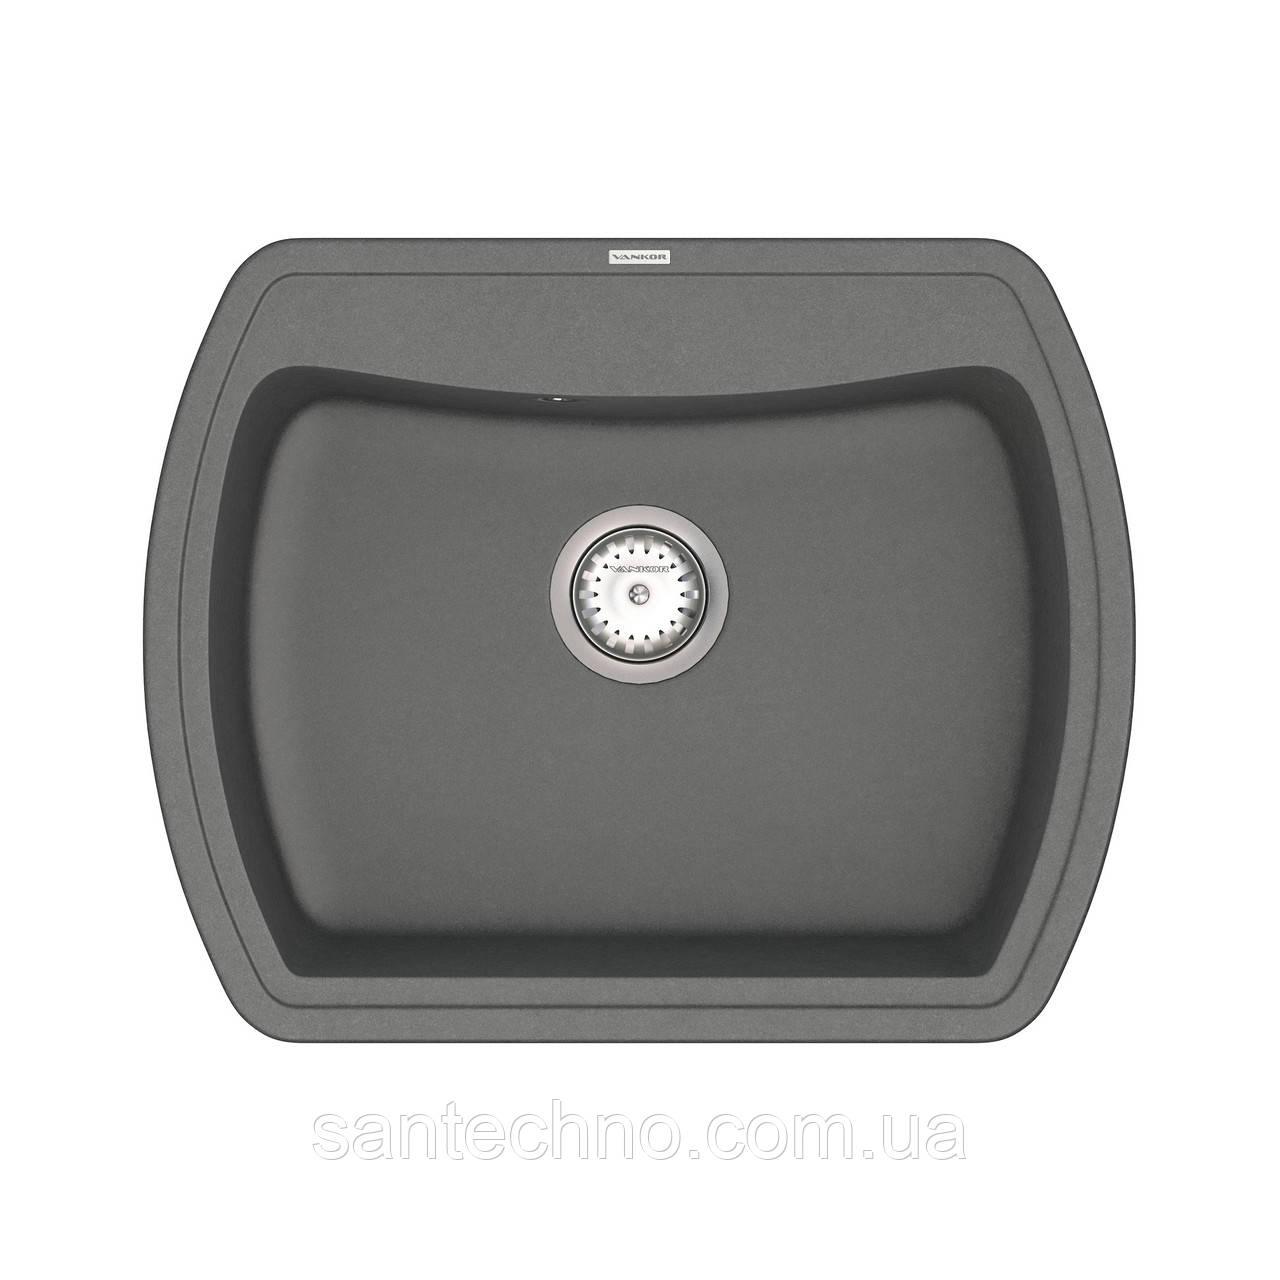 Кухонна мийка VANKOR Norton NMP 01.63 Gray + сифон VANKOR